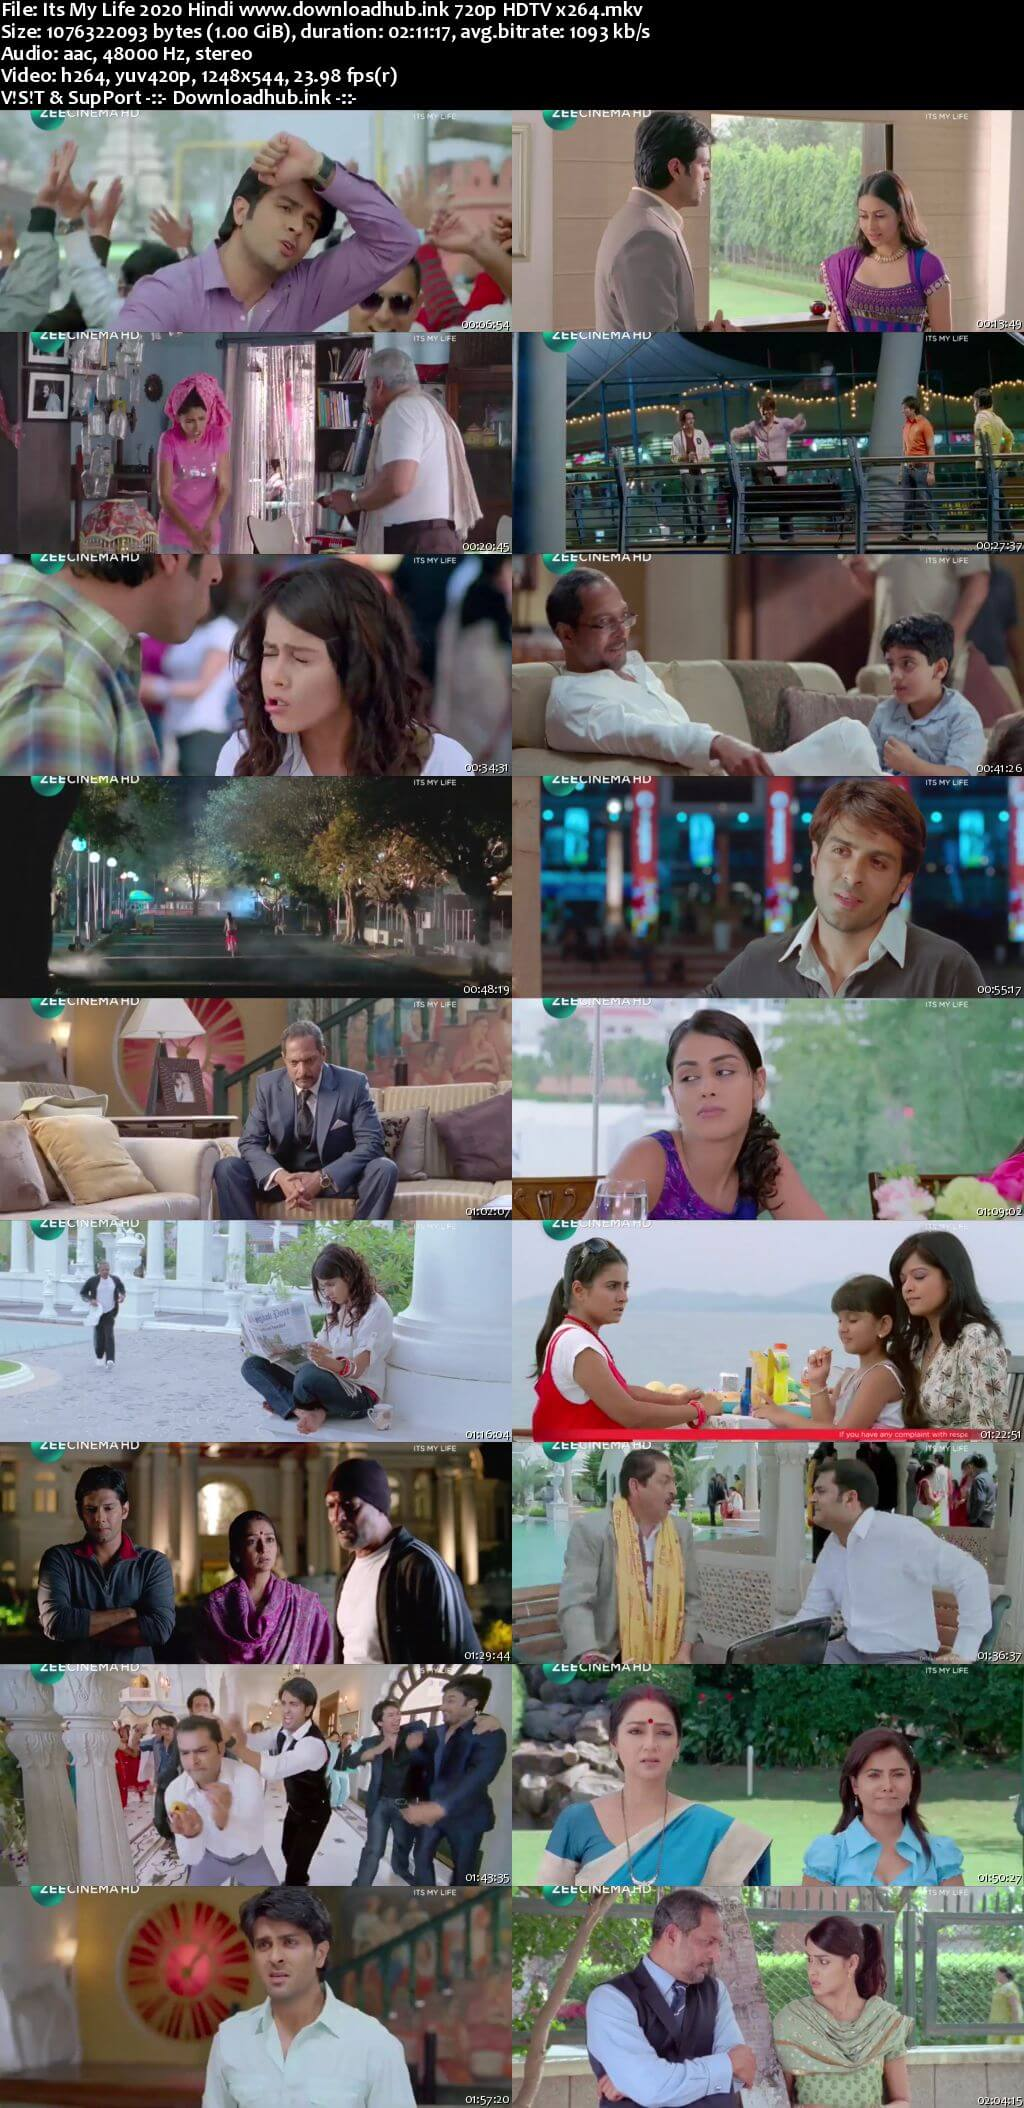 Its My Life 2020 Hindi 720p HDTV x264